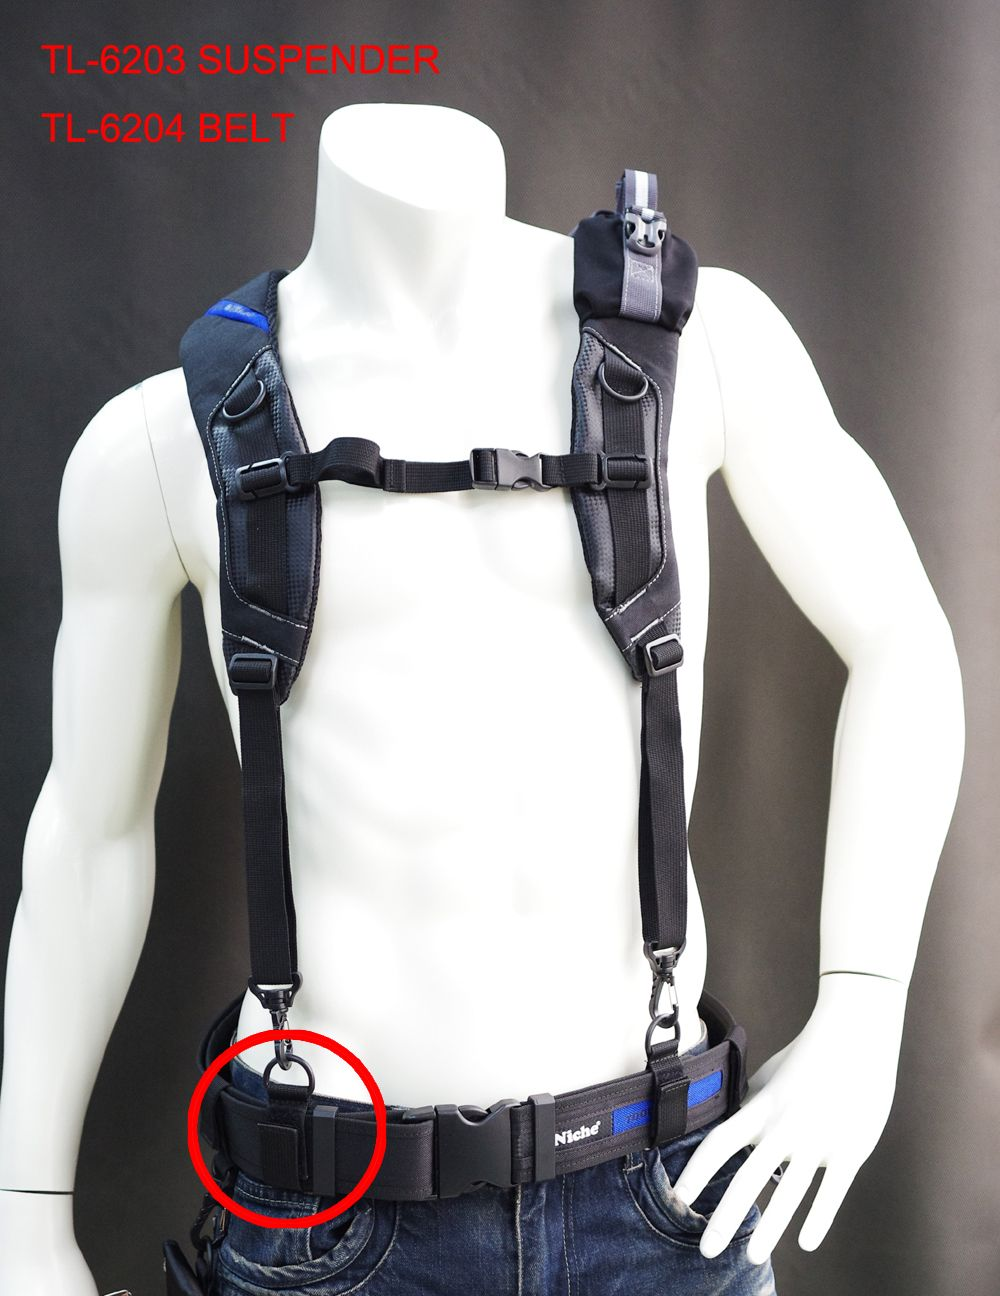 Combine usage with Suspender Rig